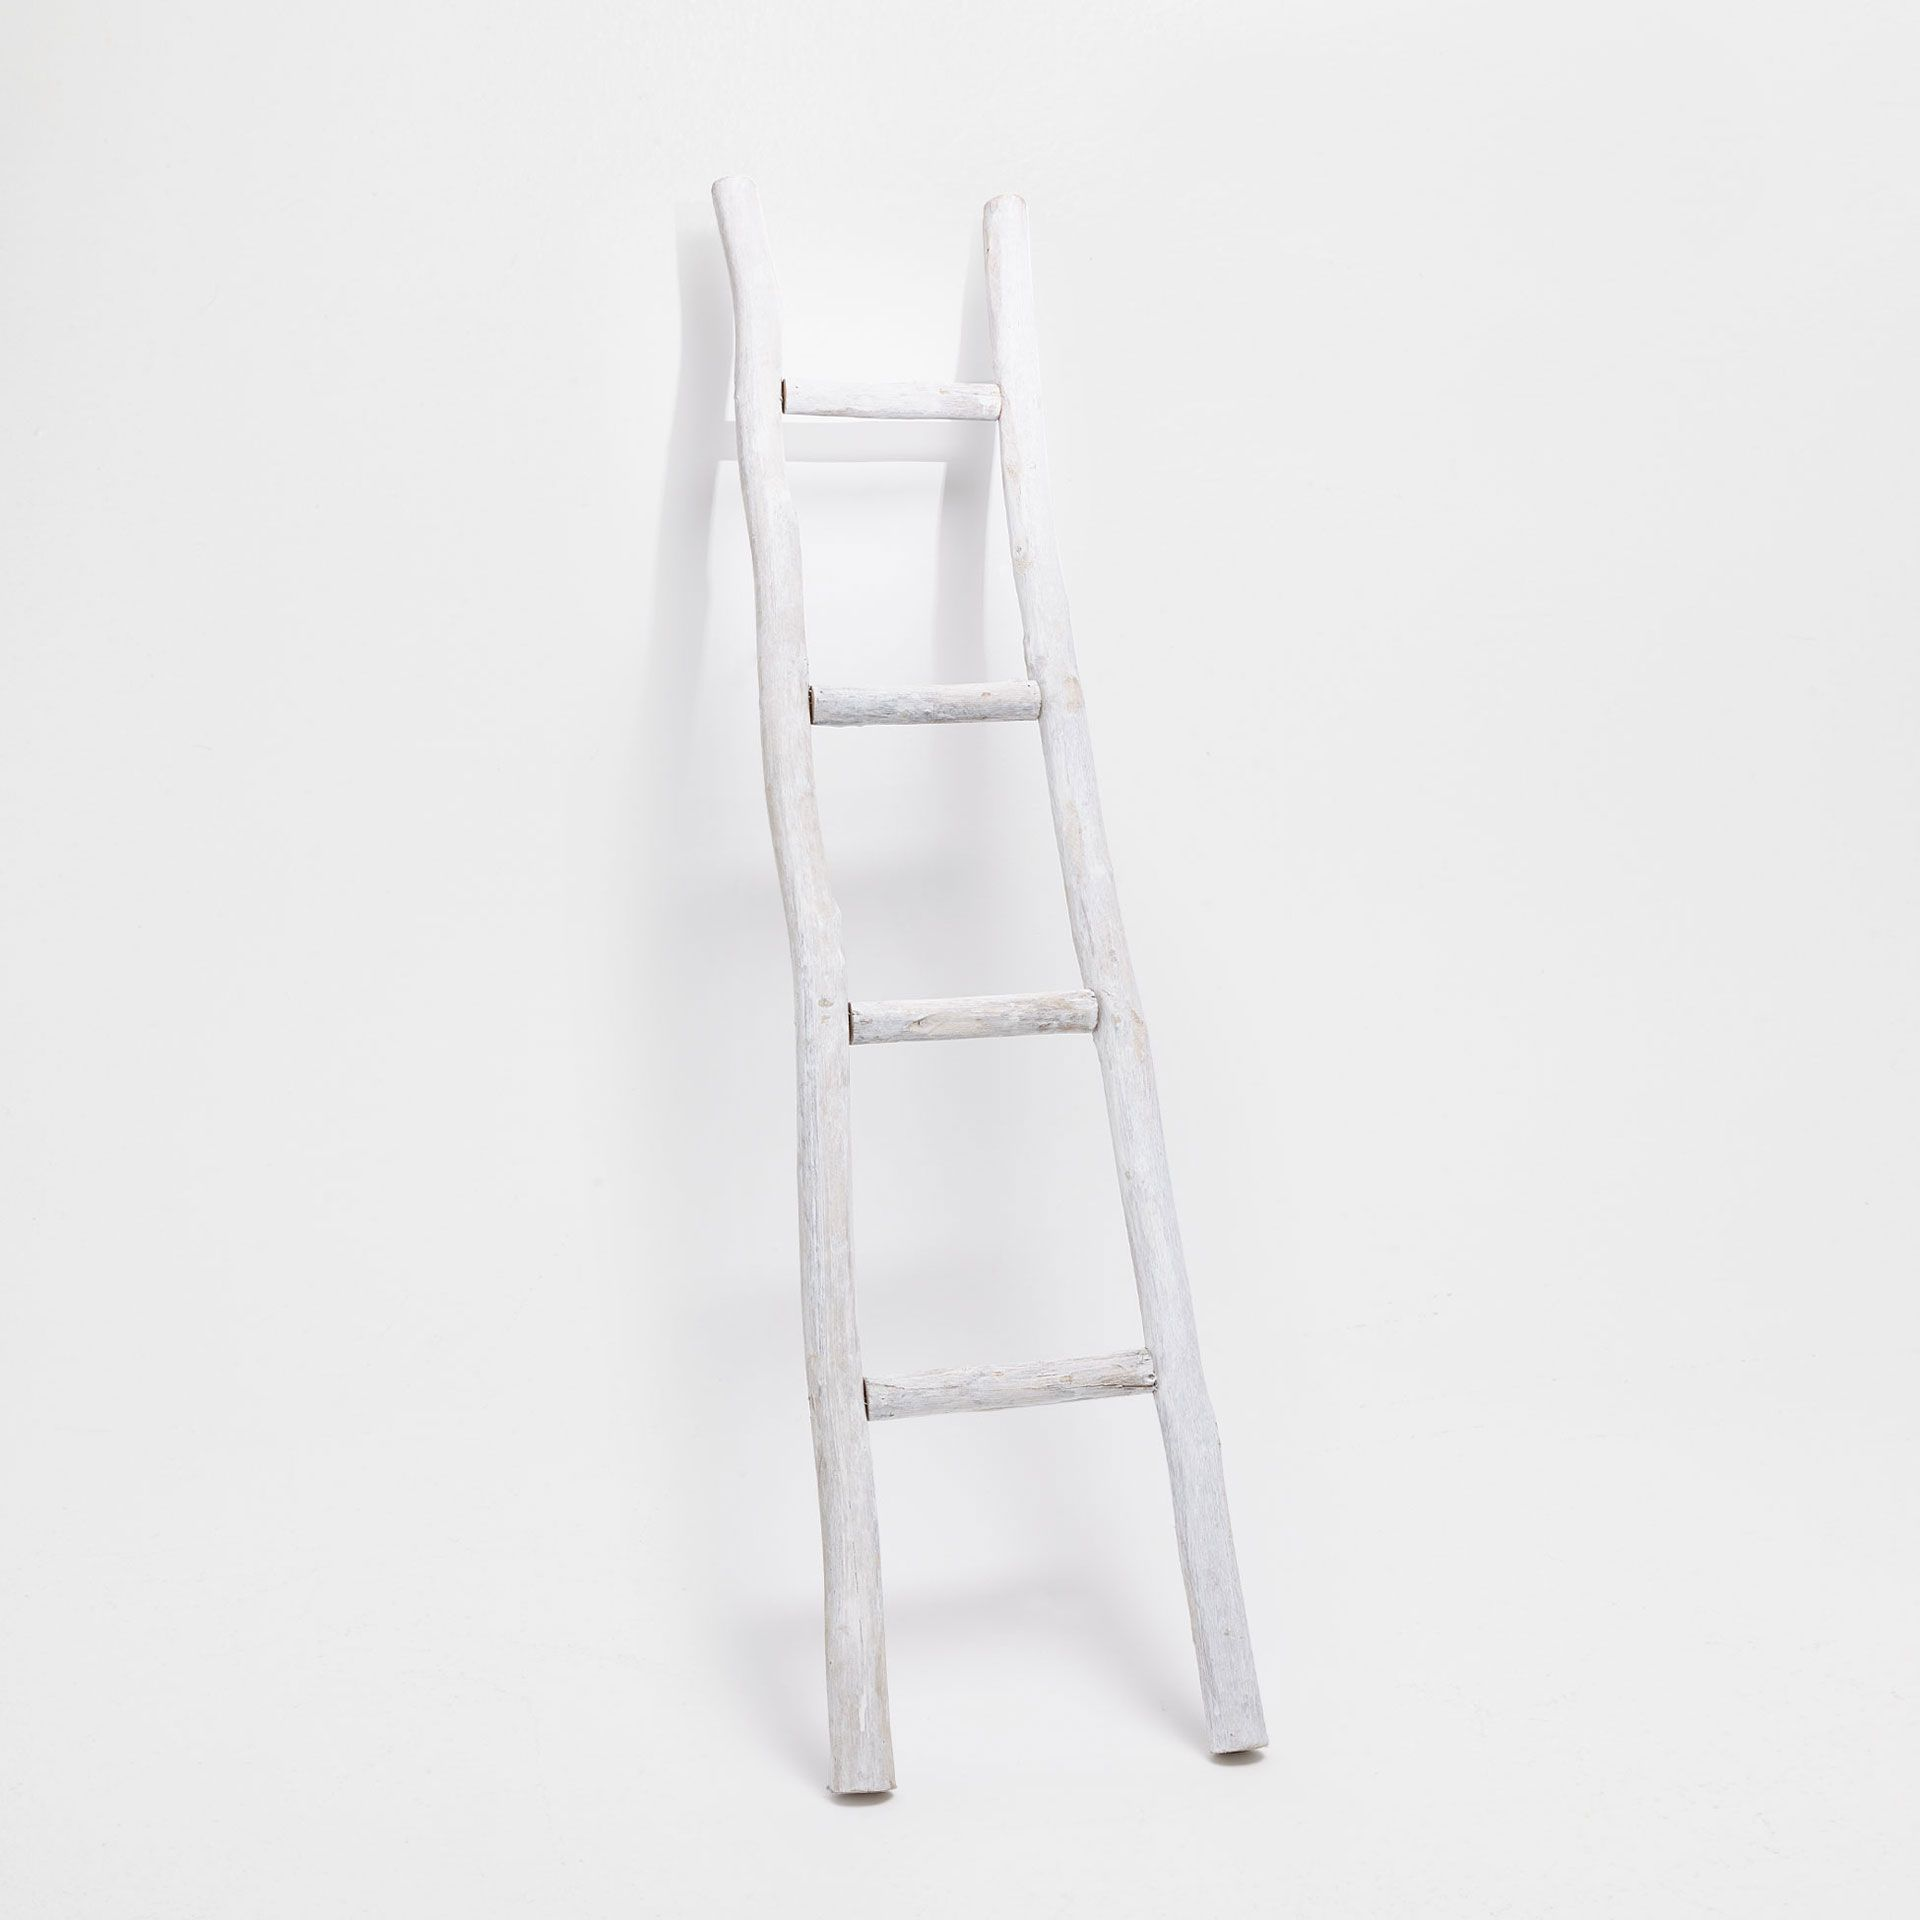 Clothes Rails & Coat Stands Deco Ladder Lexy 118cm Grey Handtuchleiter Deco Ladder Scarf Holders Dress Head